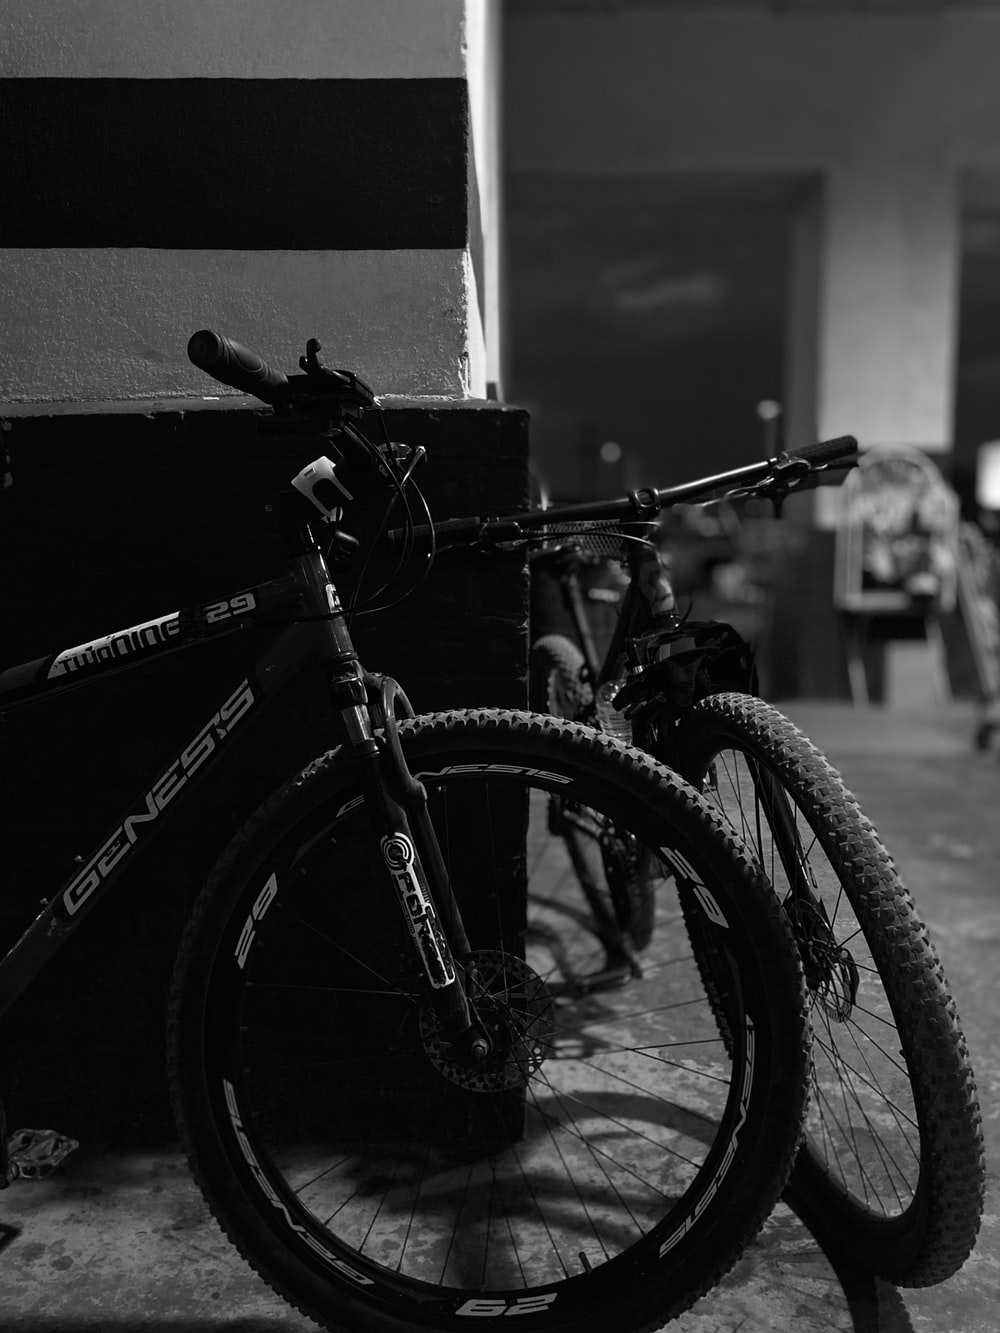 black mountain bike in grayscale photography